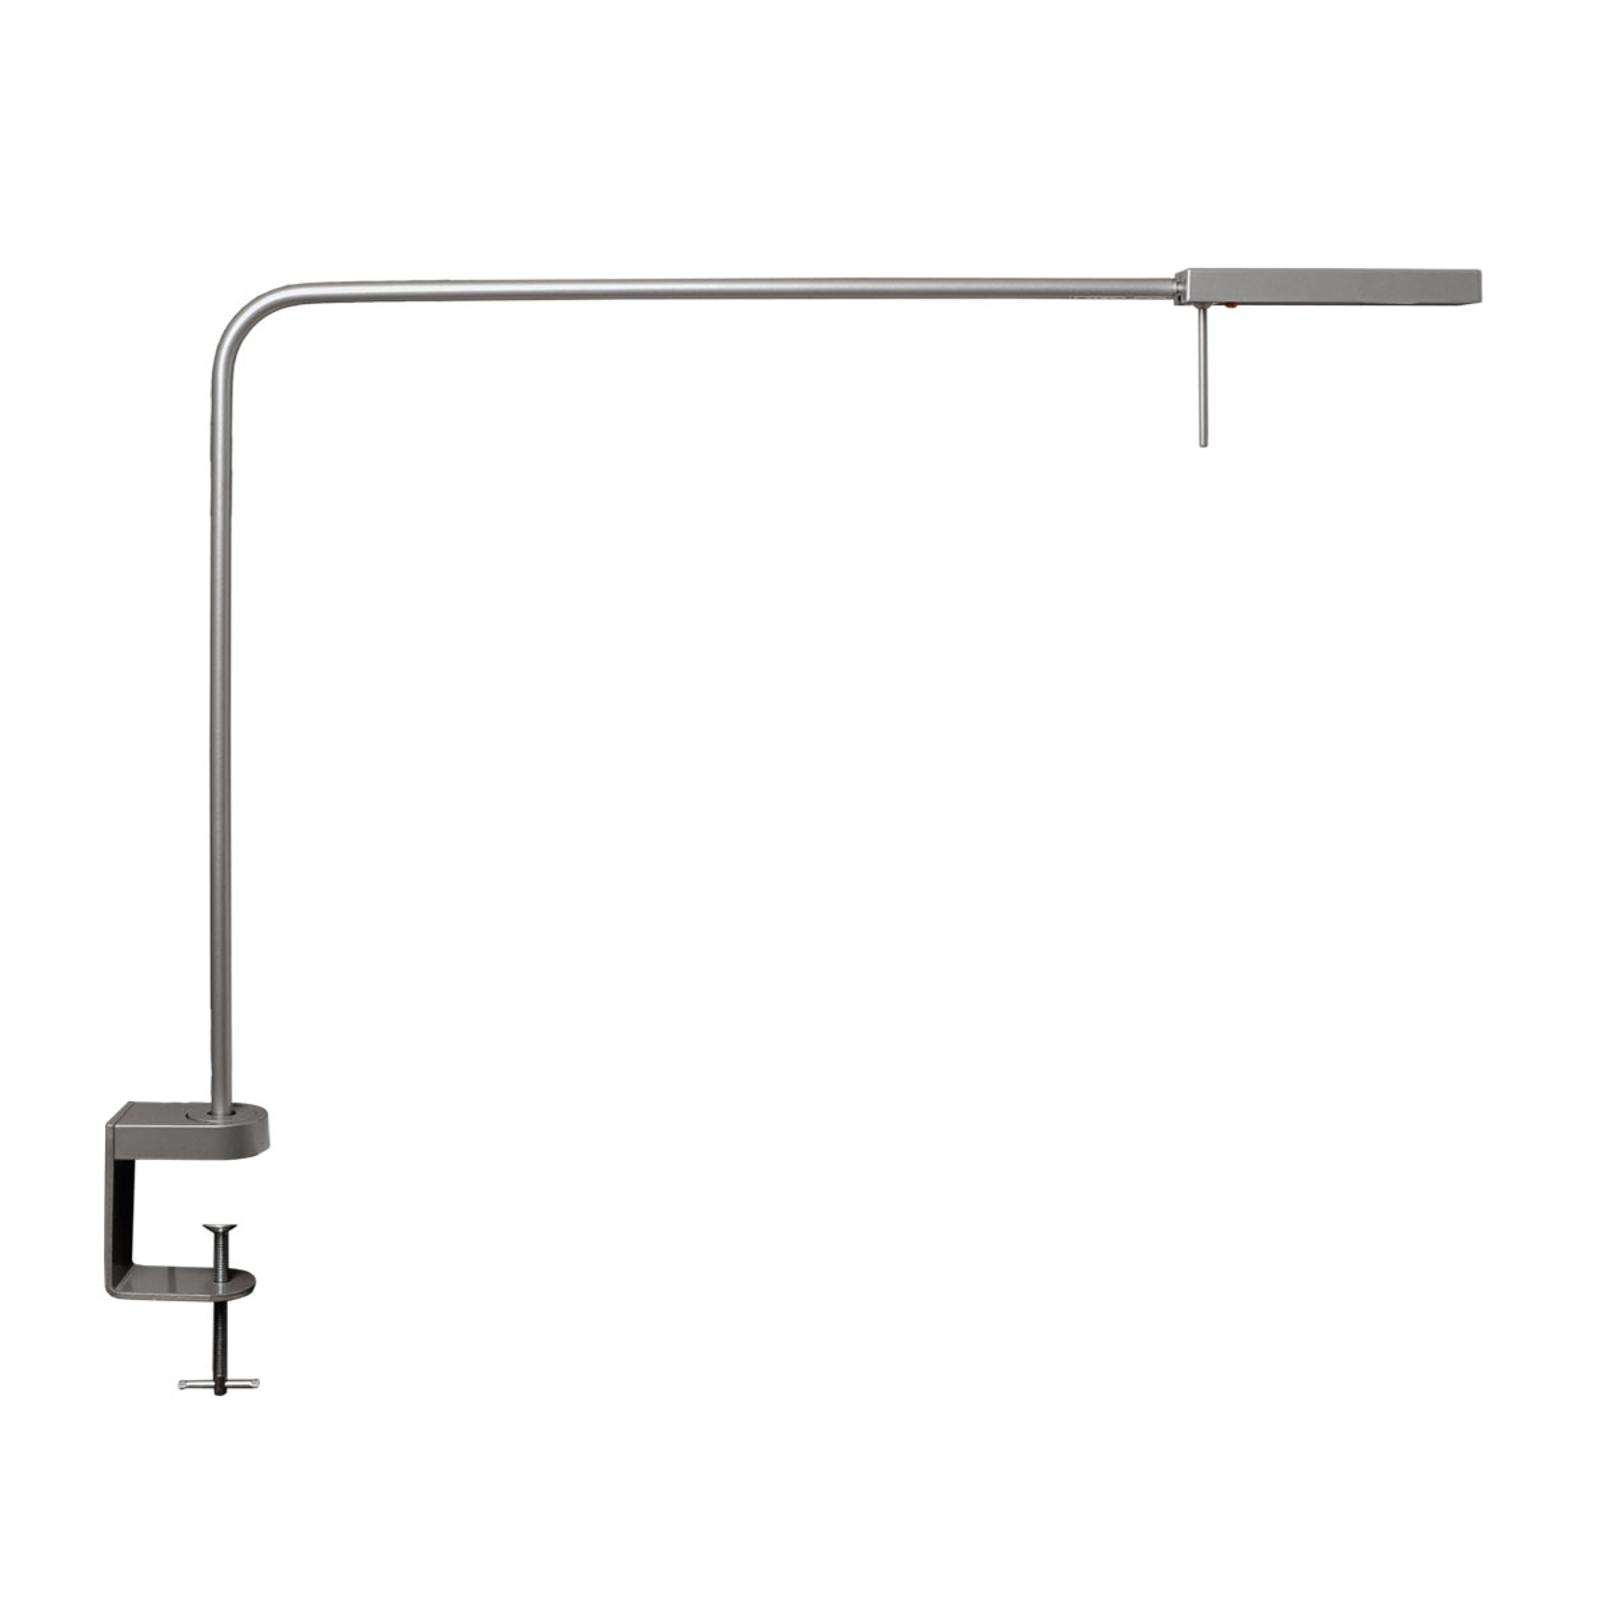 Lampada LED da lavoro Ninety con pinza argento